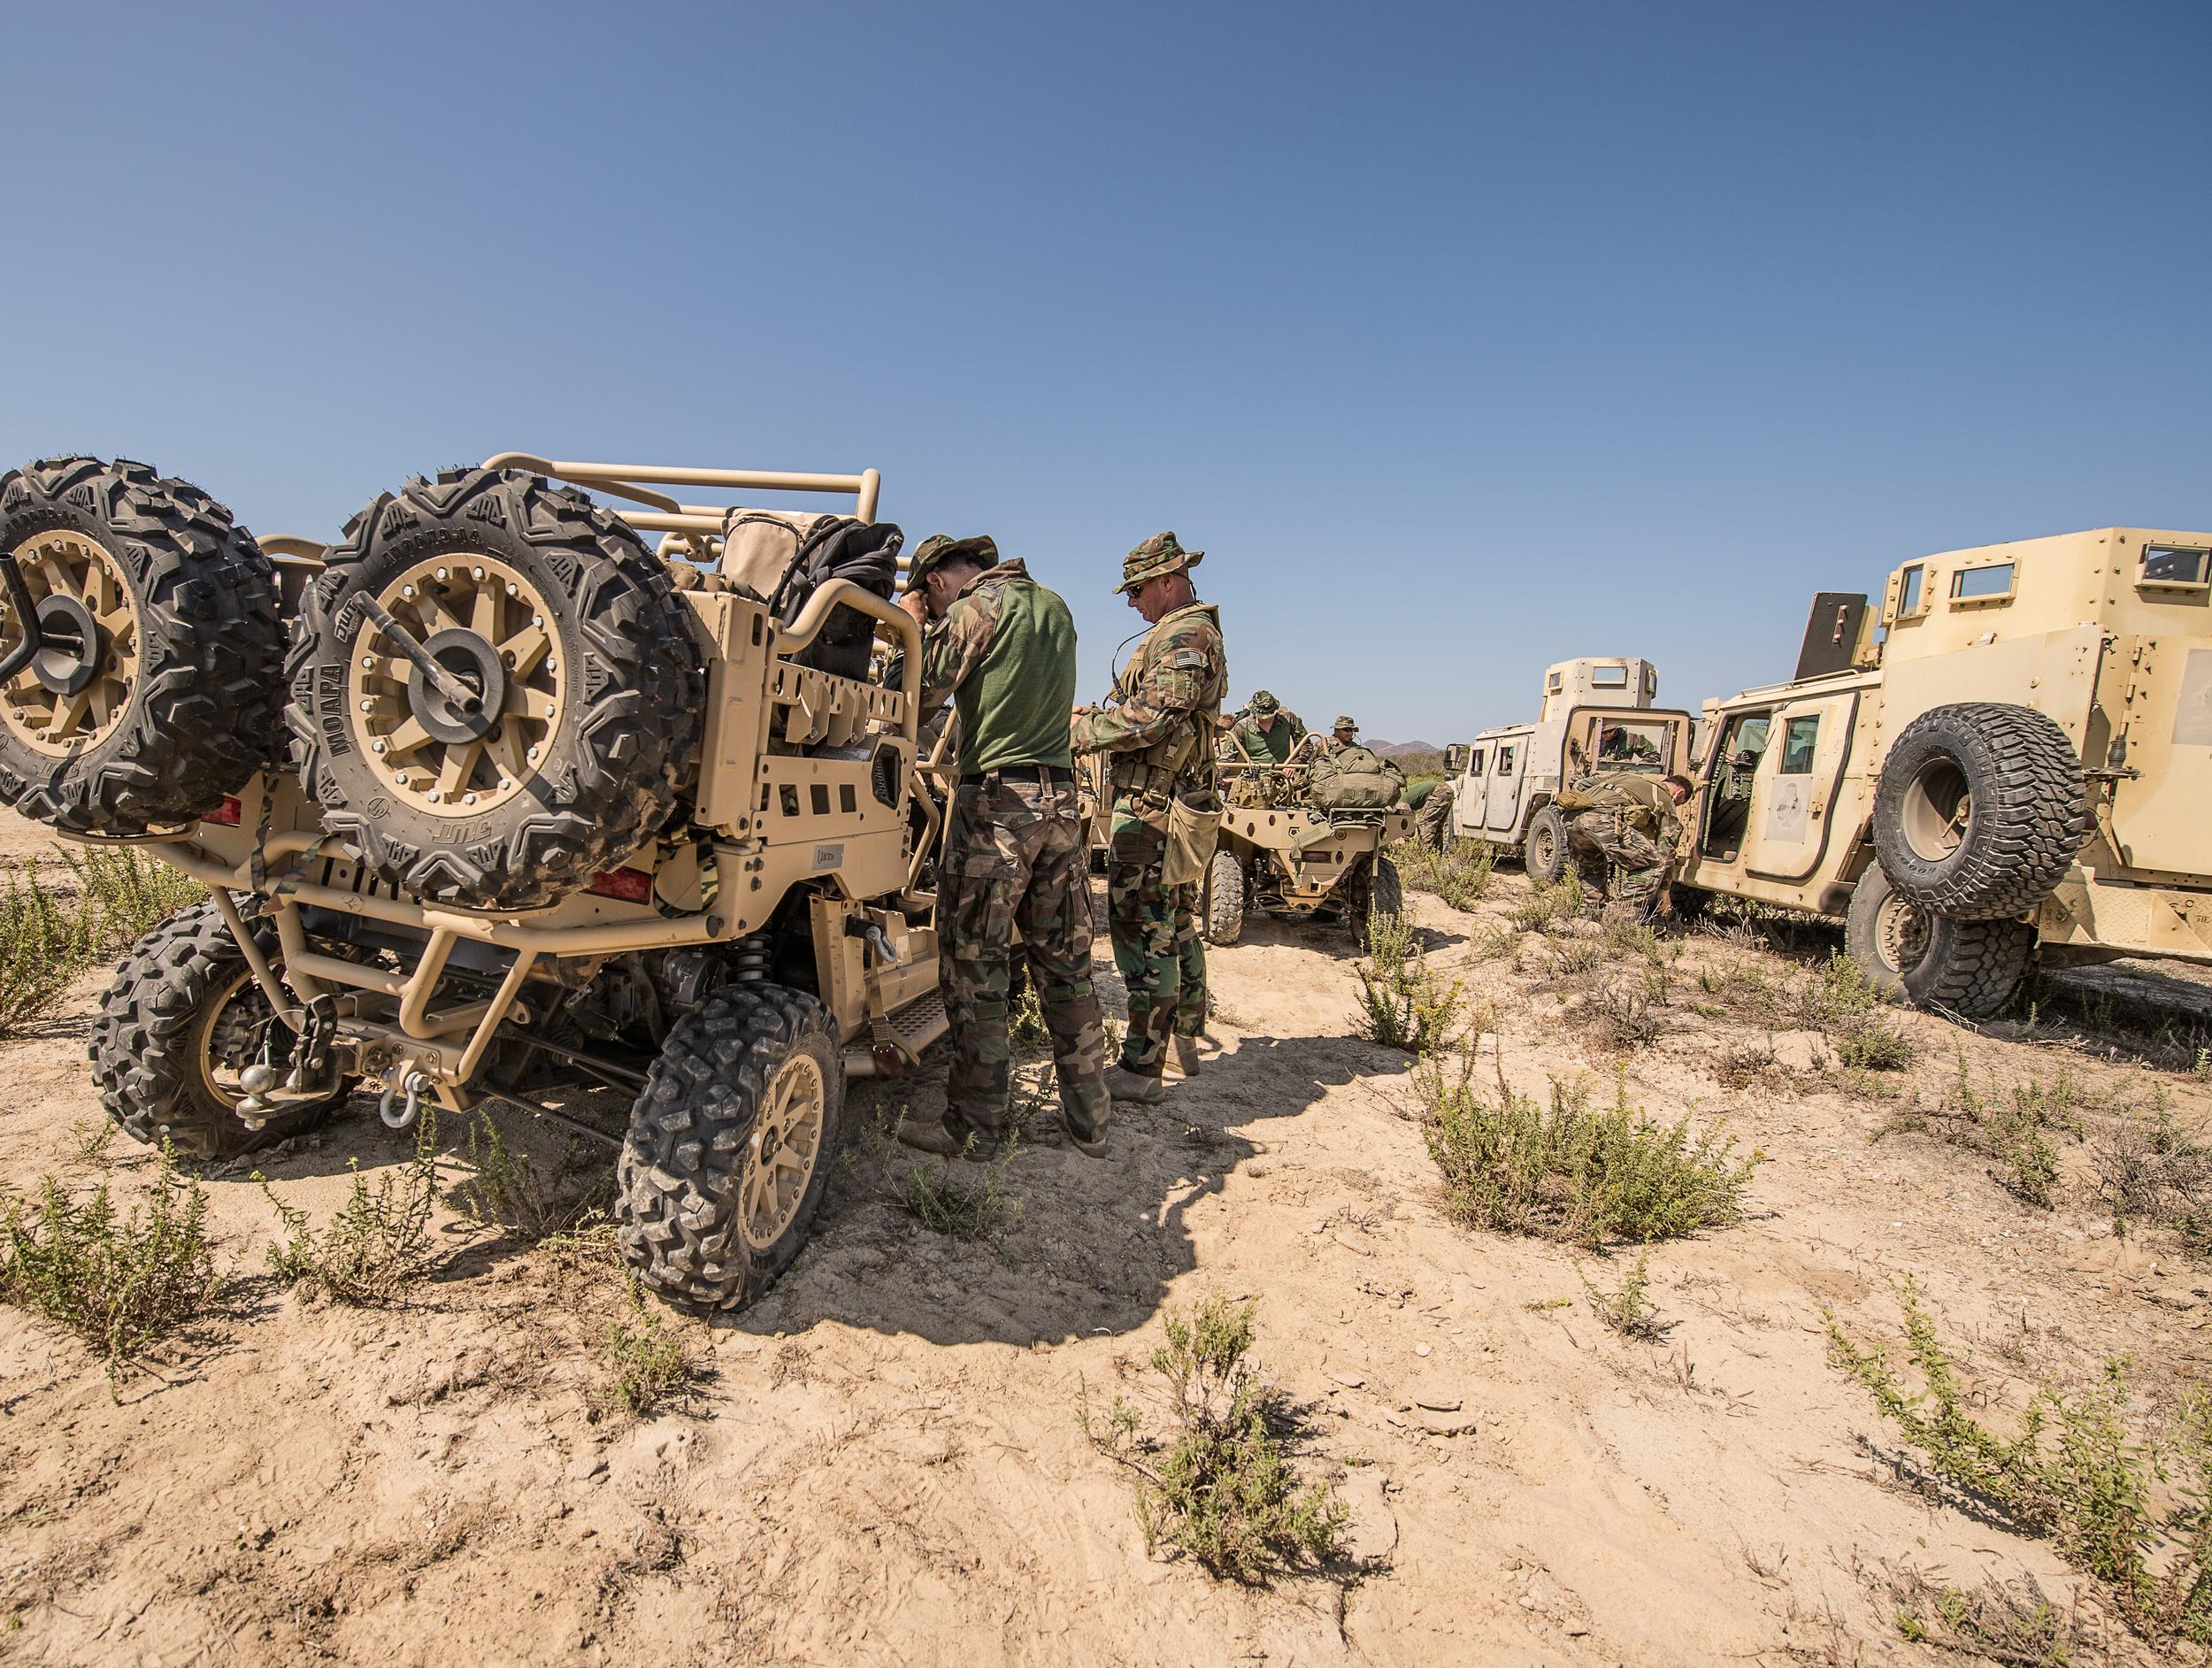 1st Marine Raider Battalion conducts ground training at Camp Pendleton. August, 1015. Photo by Rhett Stansbury